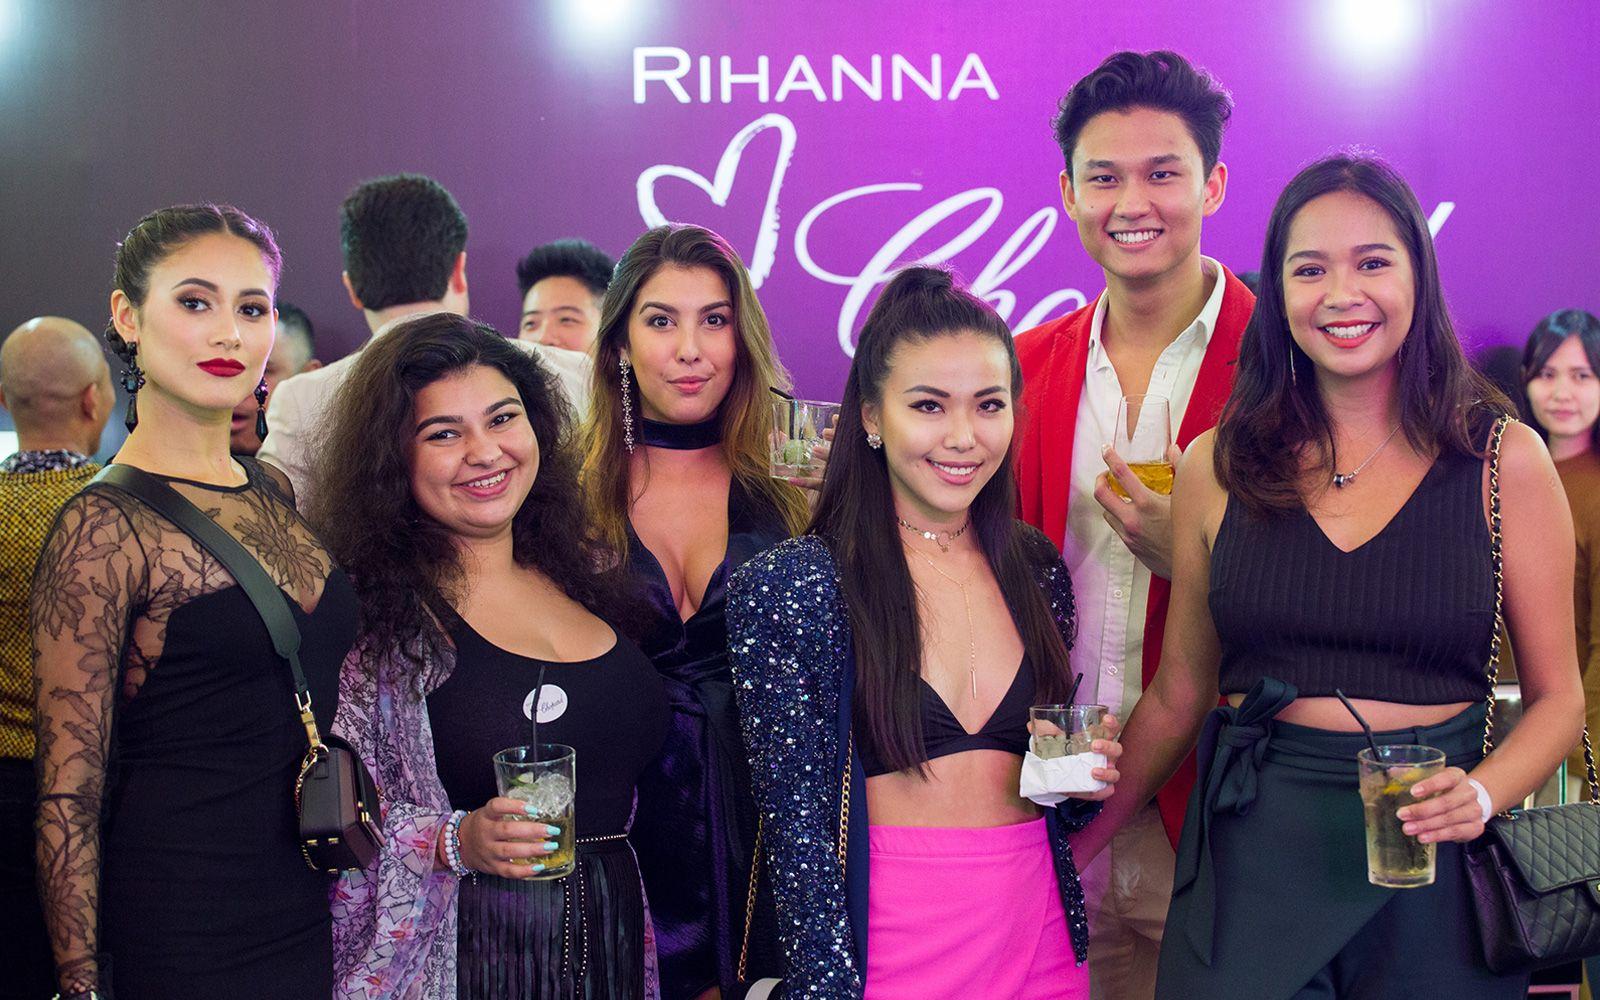 Tunku Elana Khyra, Niki Dowlani, Soraya Matthews, Melissa Yang, Matthew Shim and Eliza Khamil